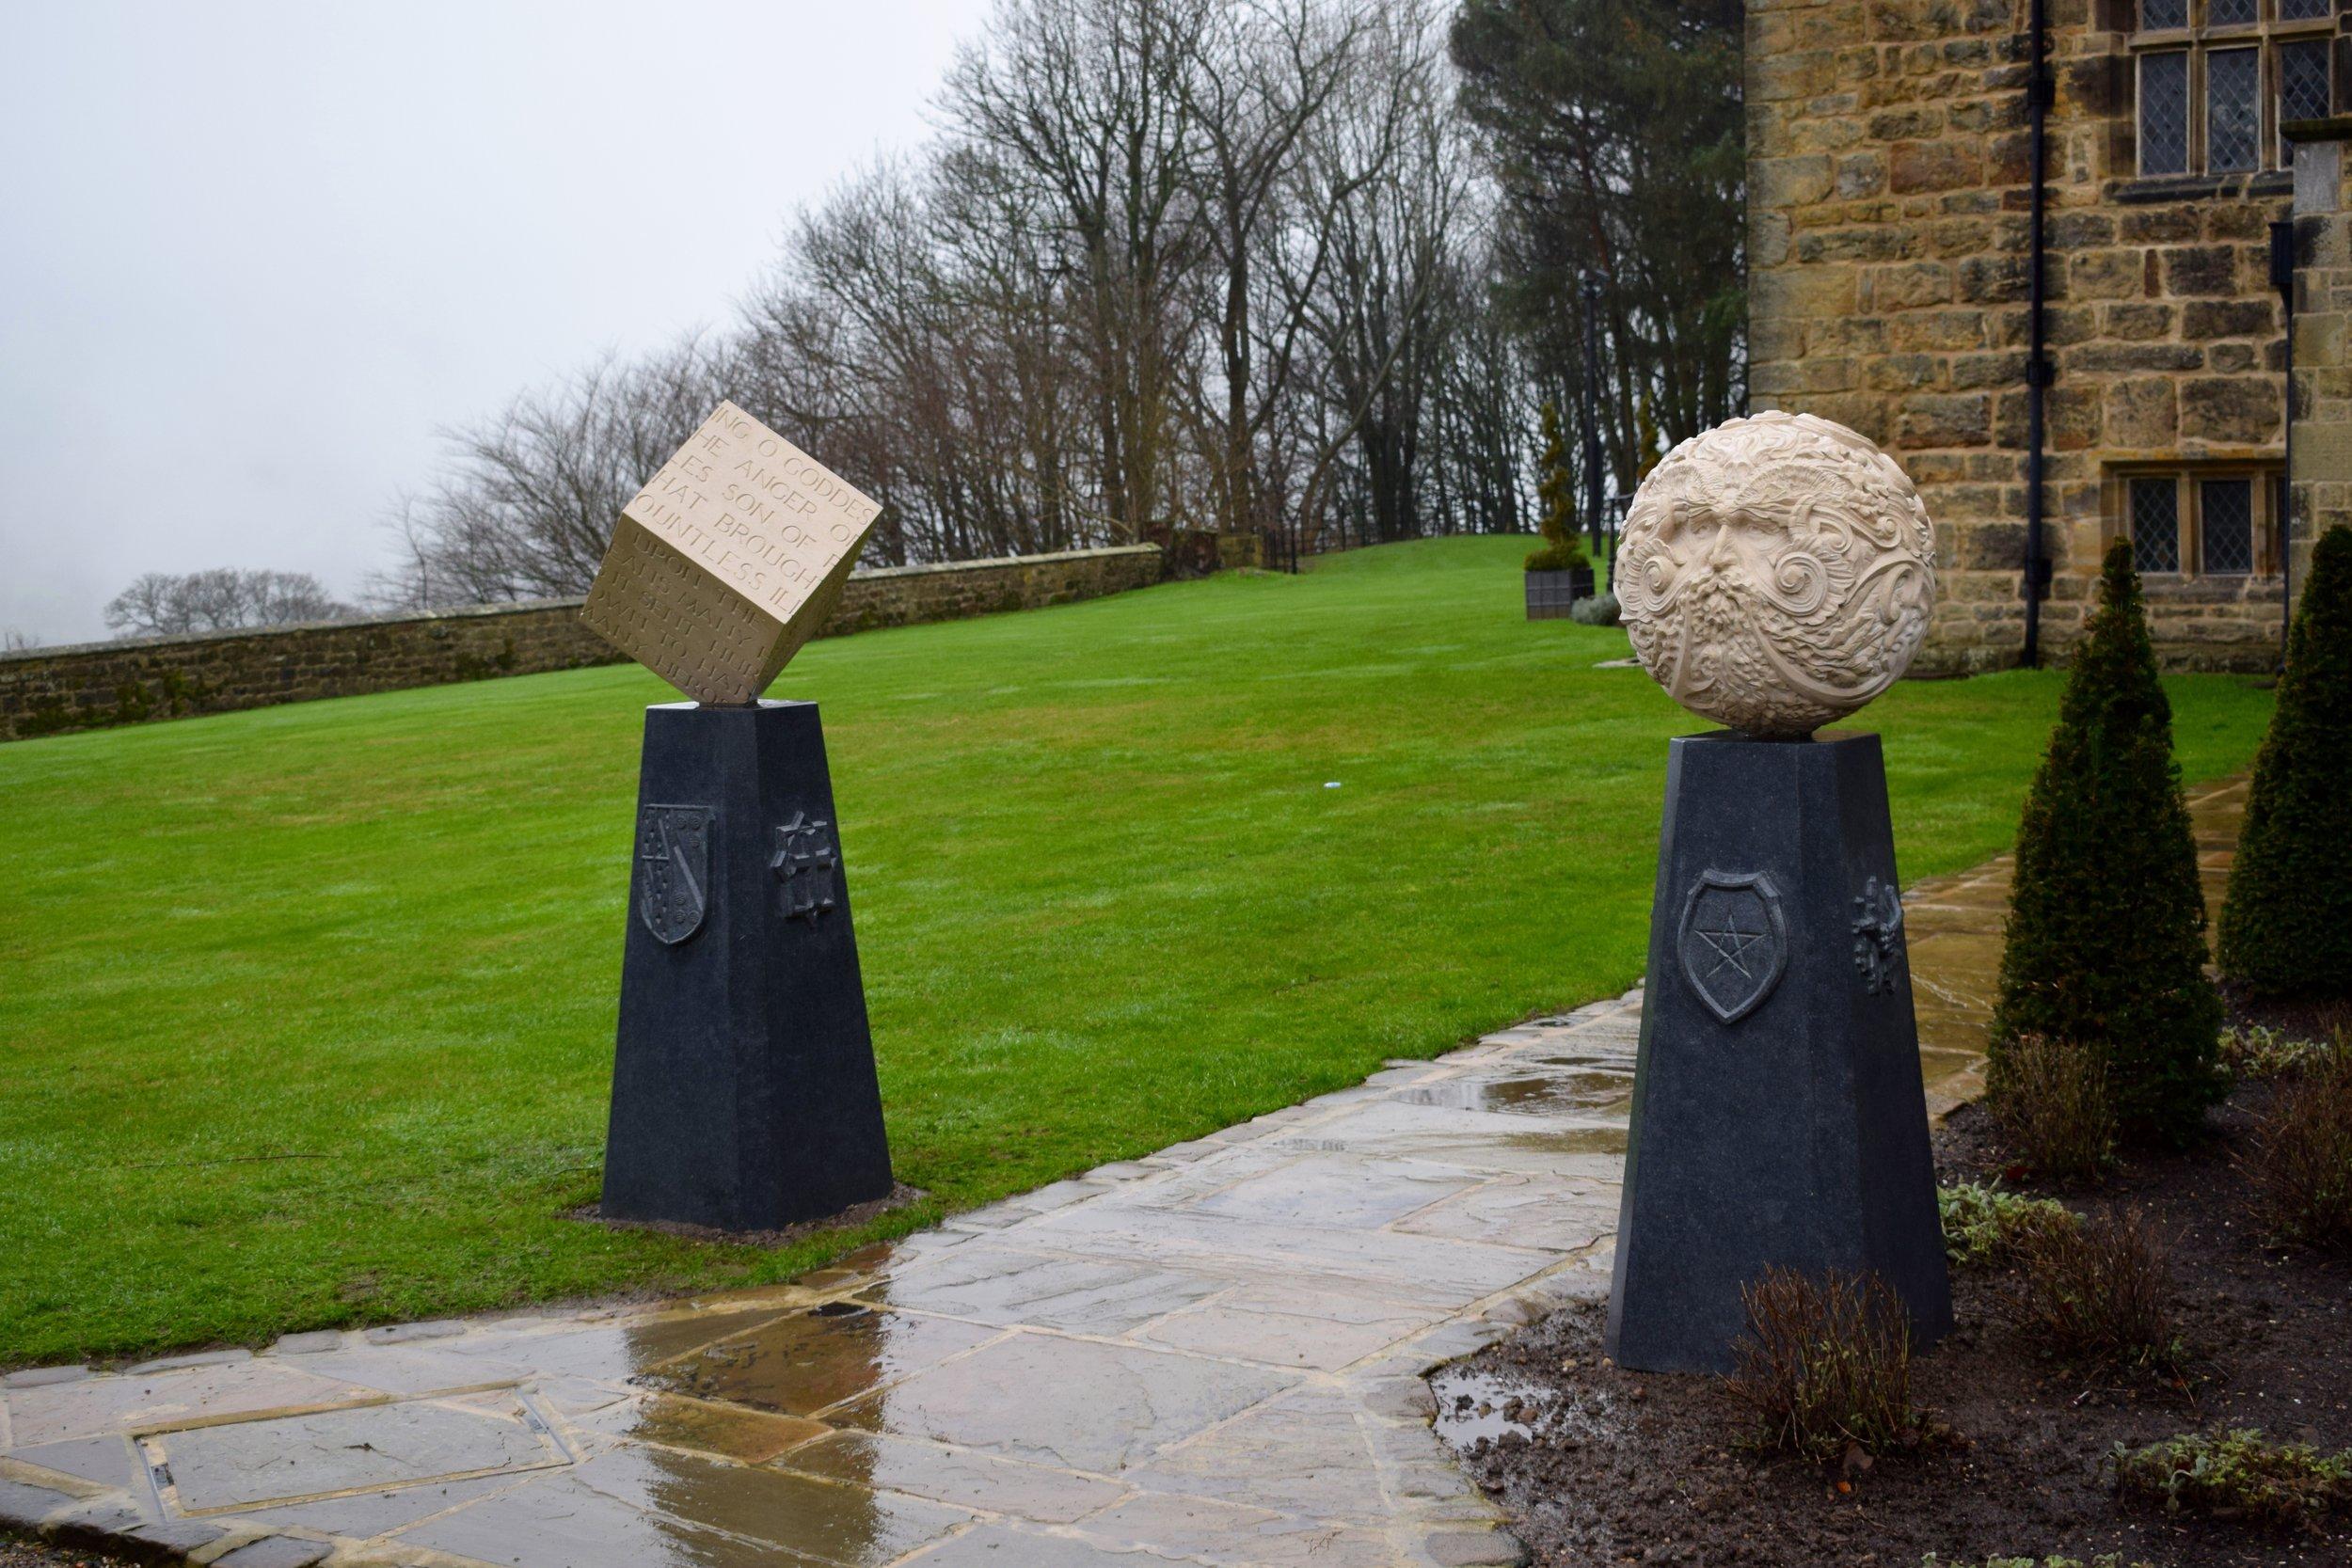 Pagan Pillars carved in Portland and Kilkenny limestone